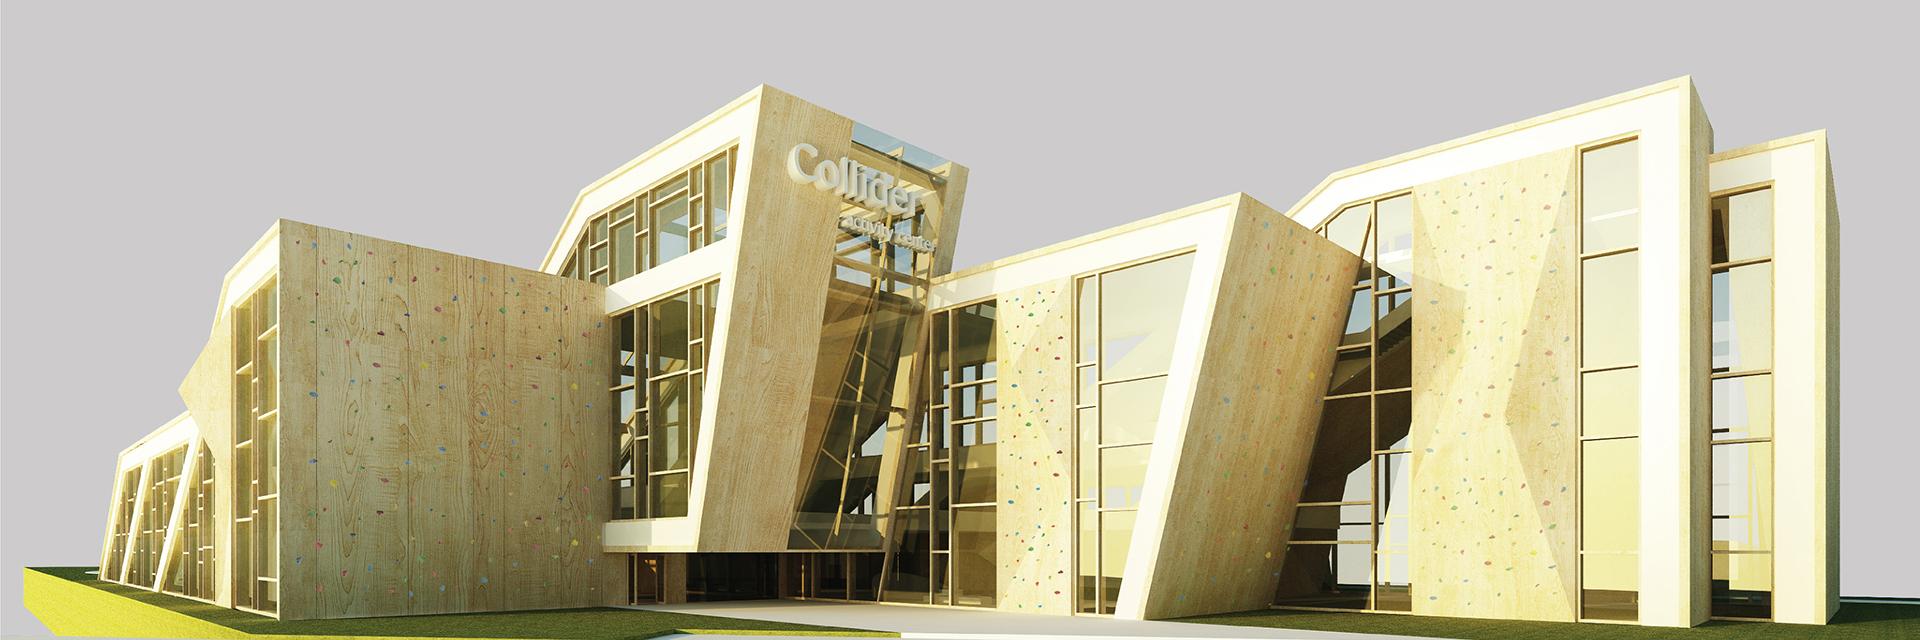 collider, sport center design, architecture, building